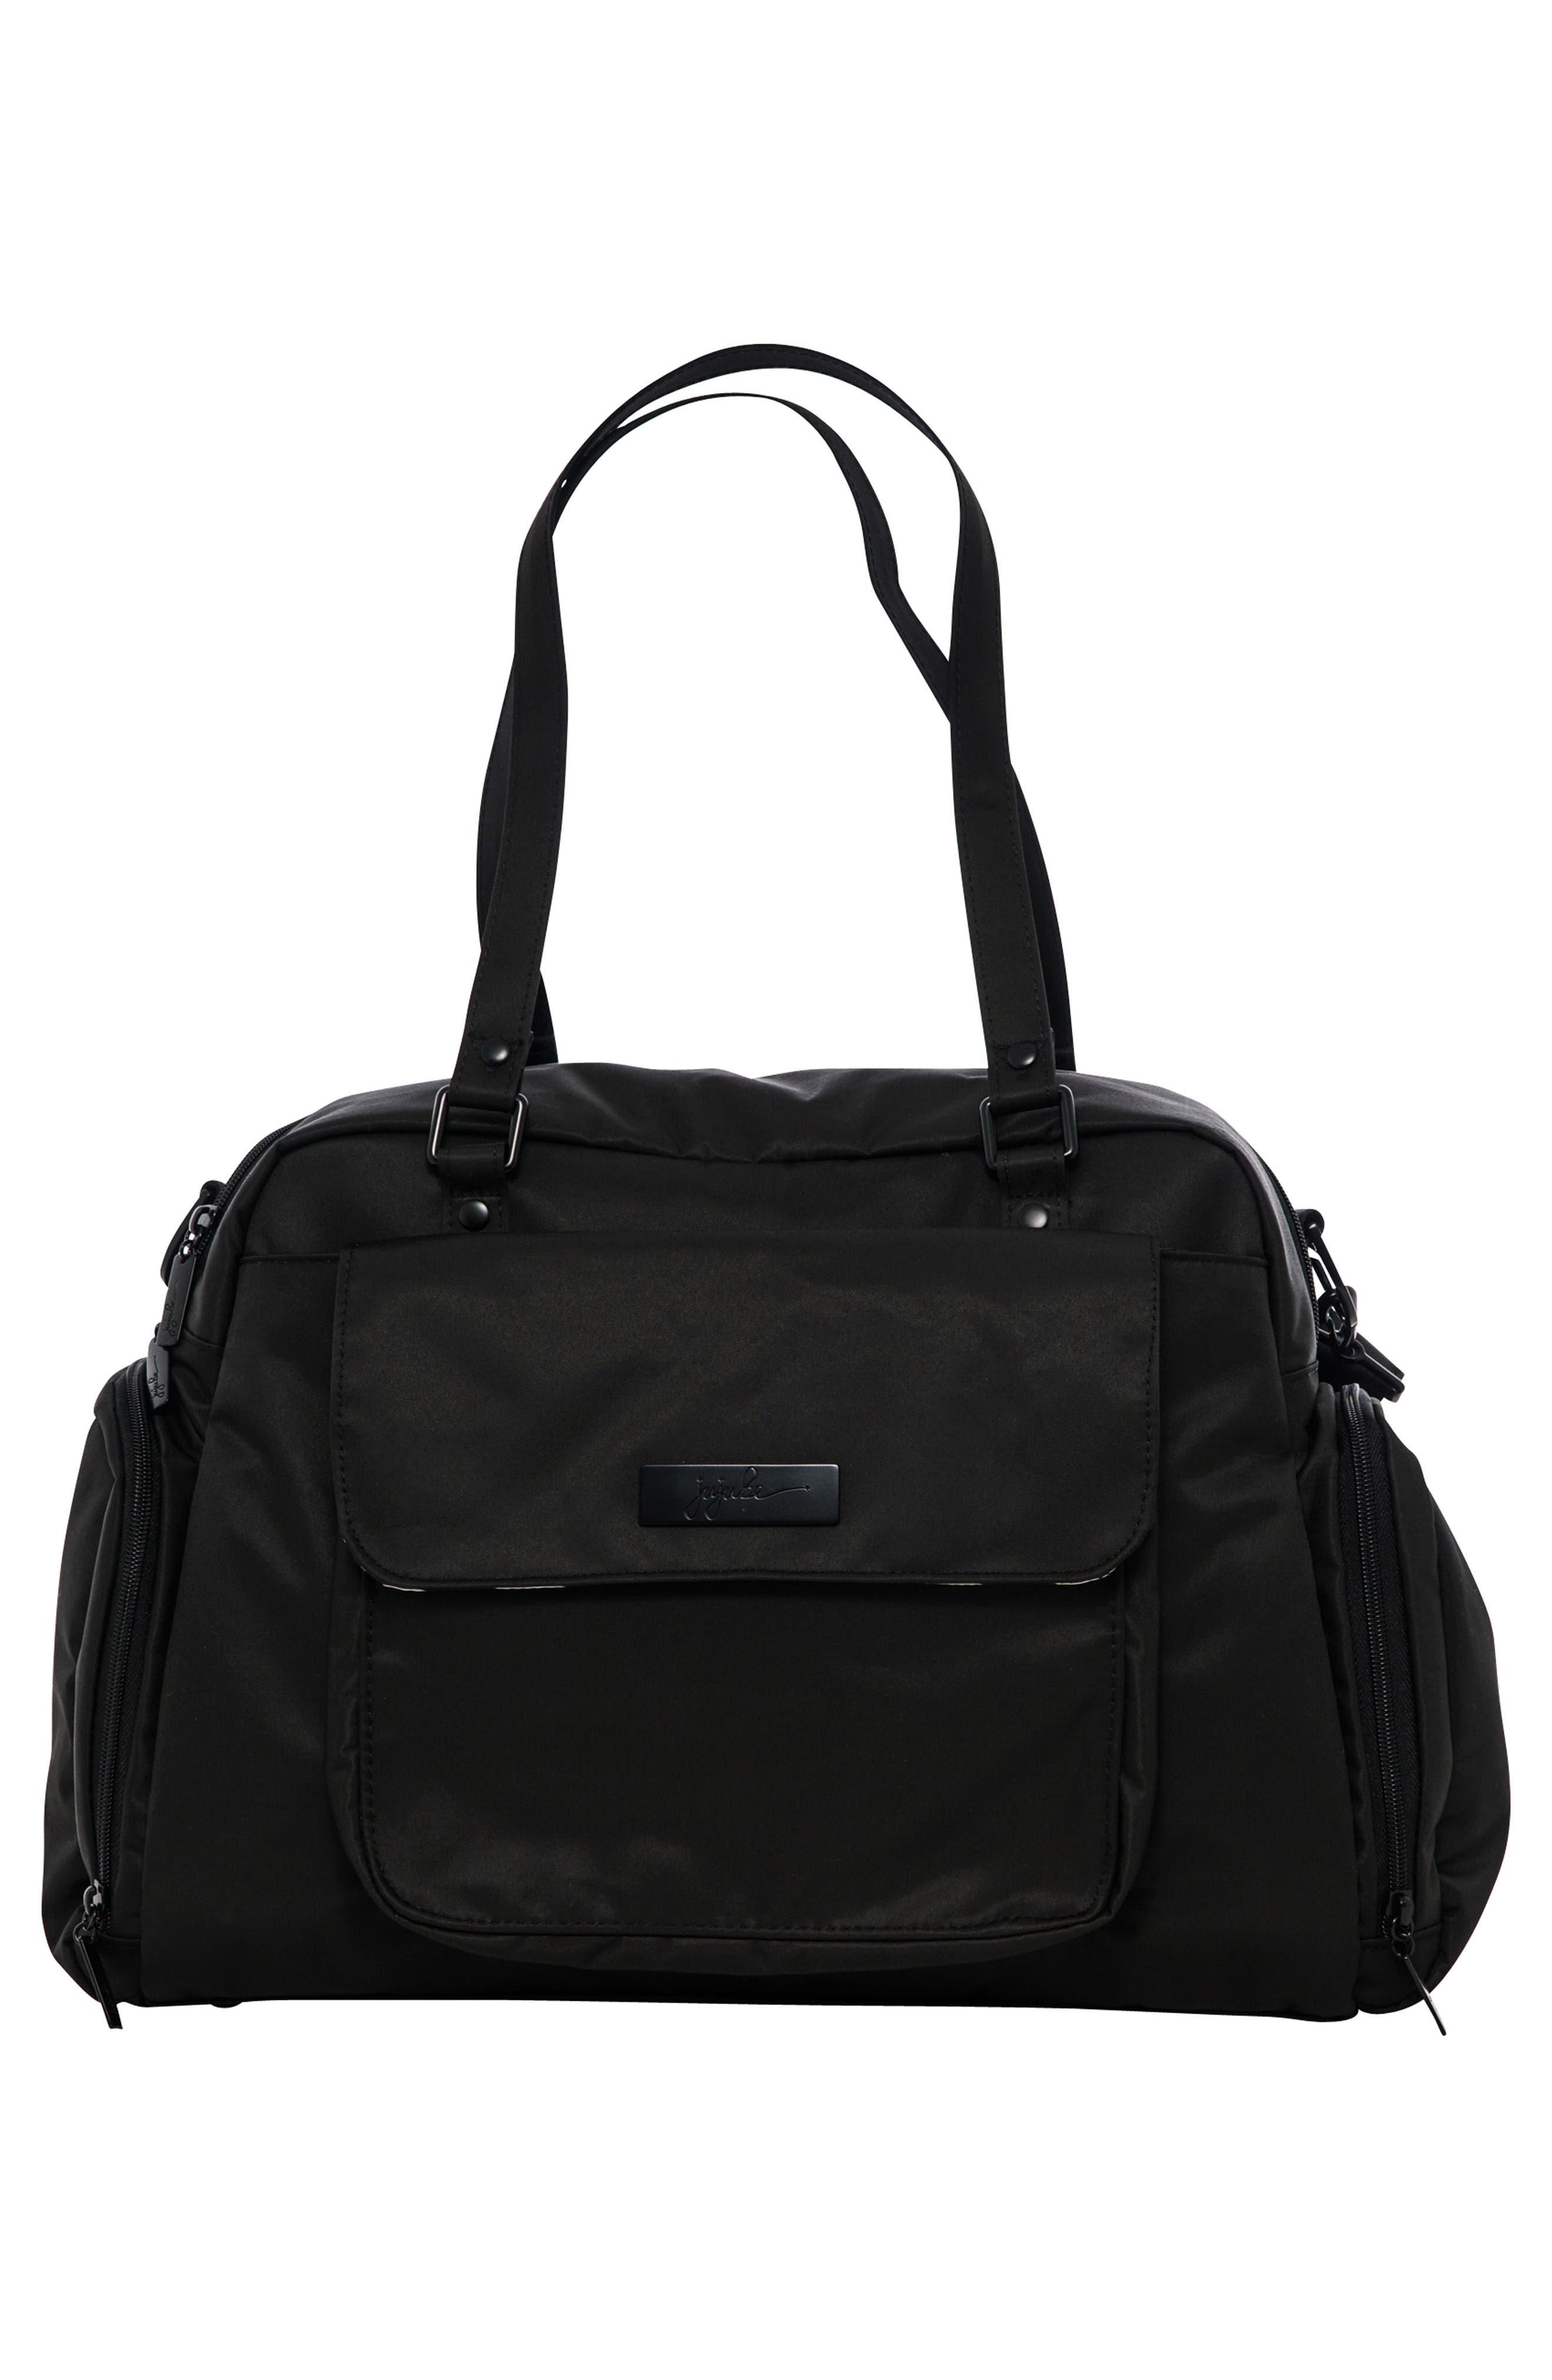 Onyx Be Pumped Bag,                             Alternate thumbnail 2, color,                             001